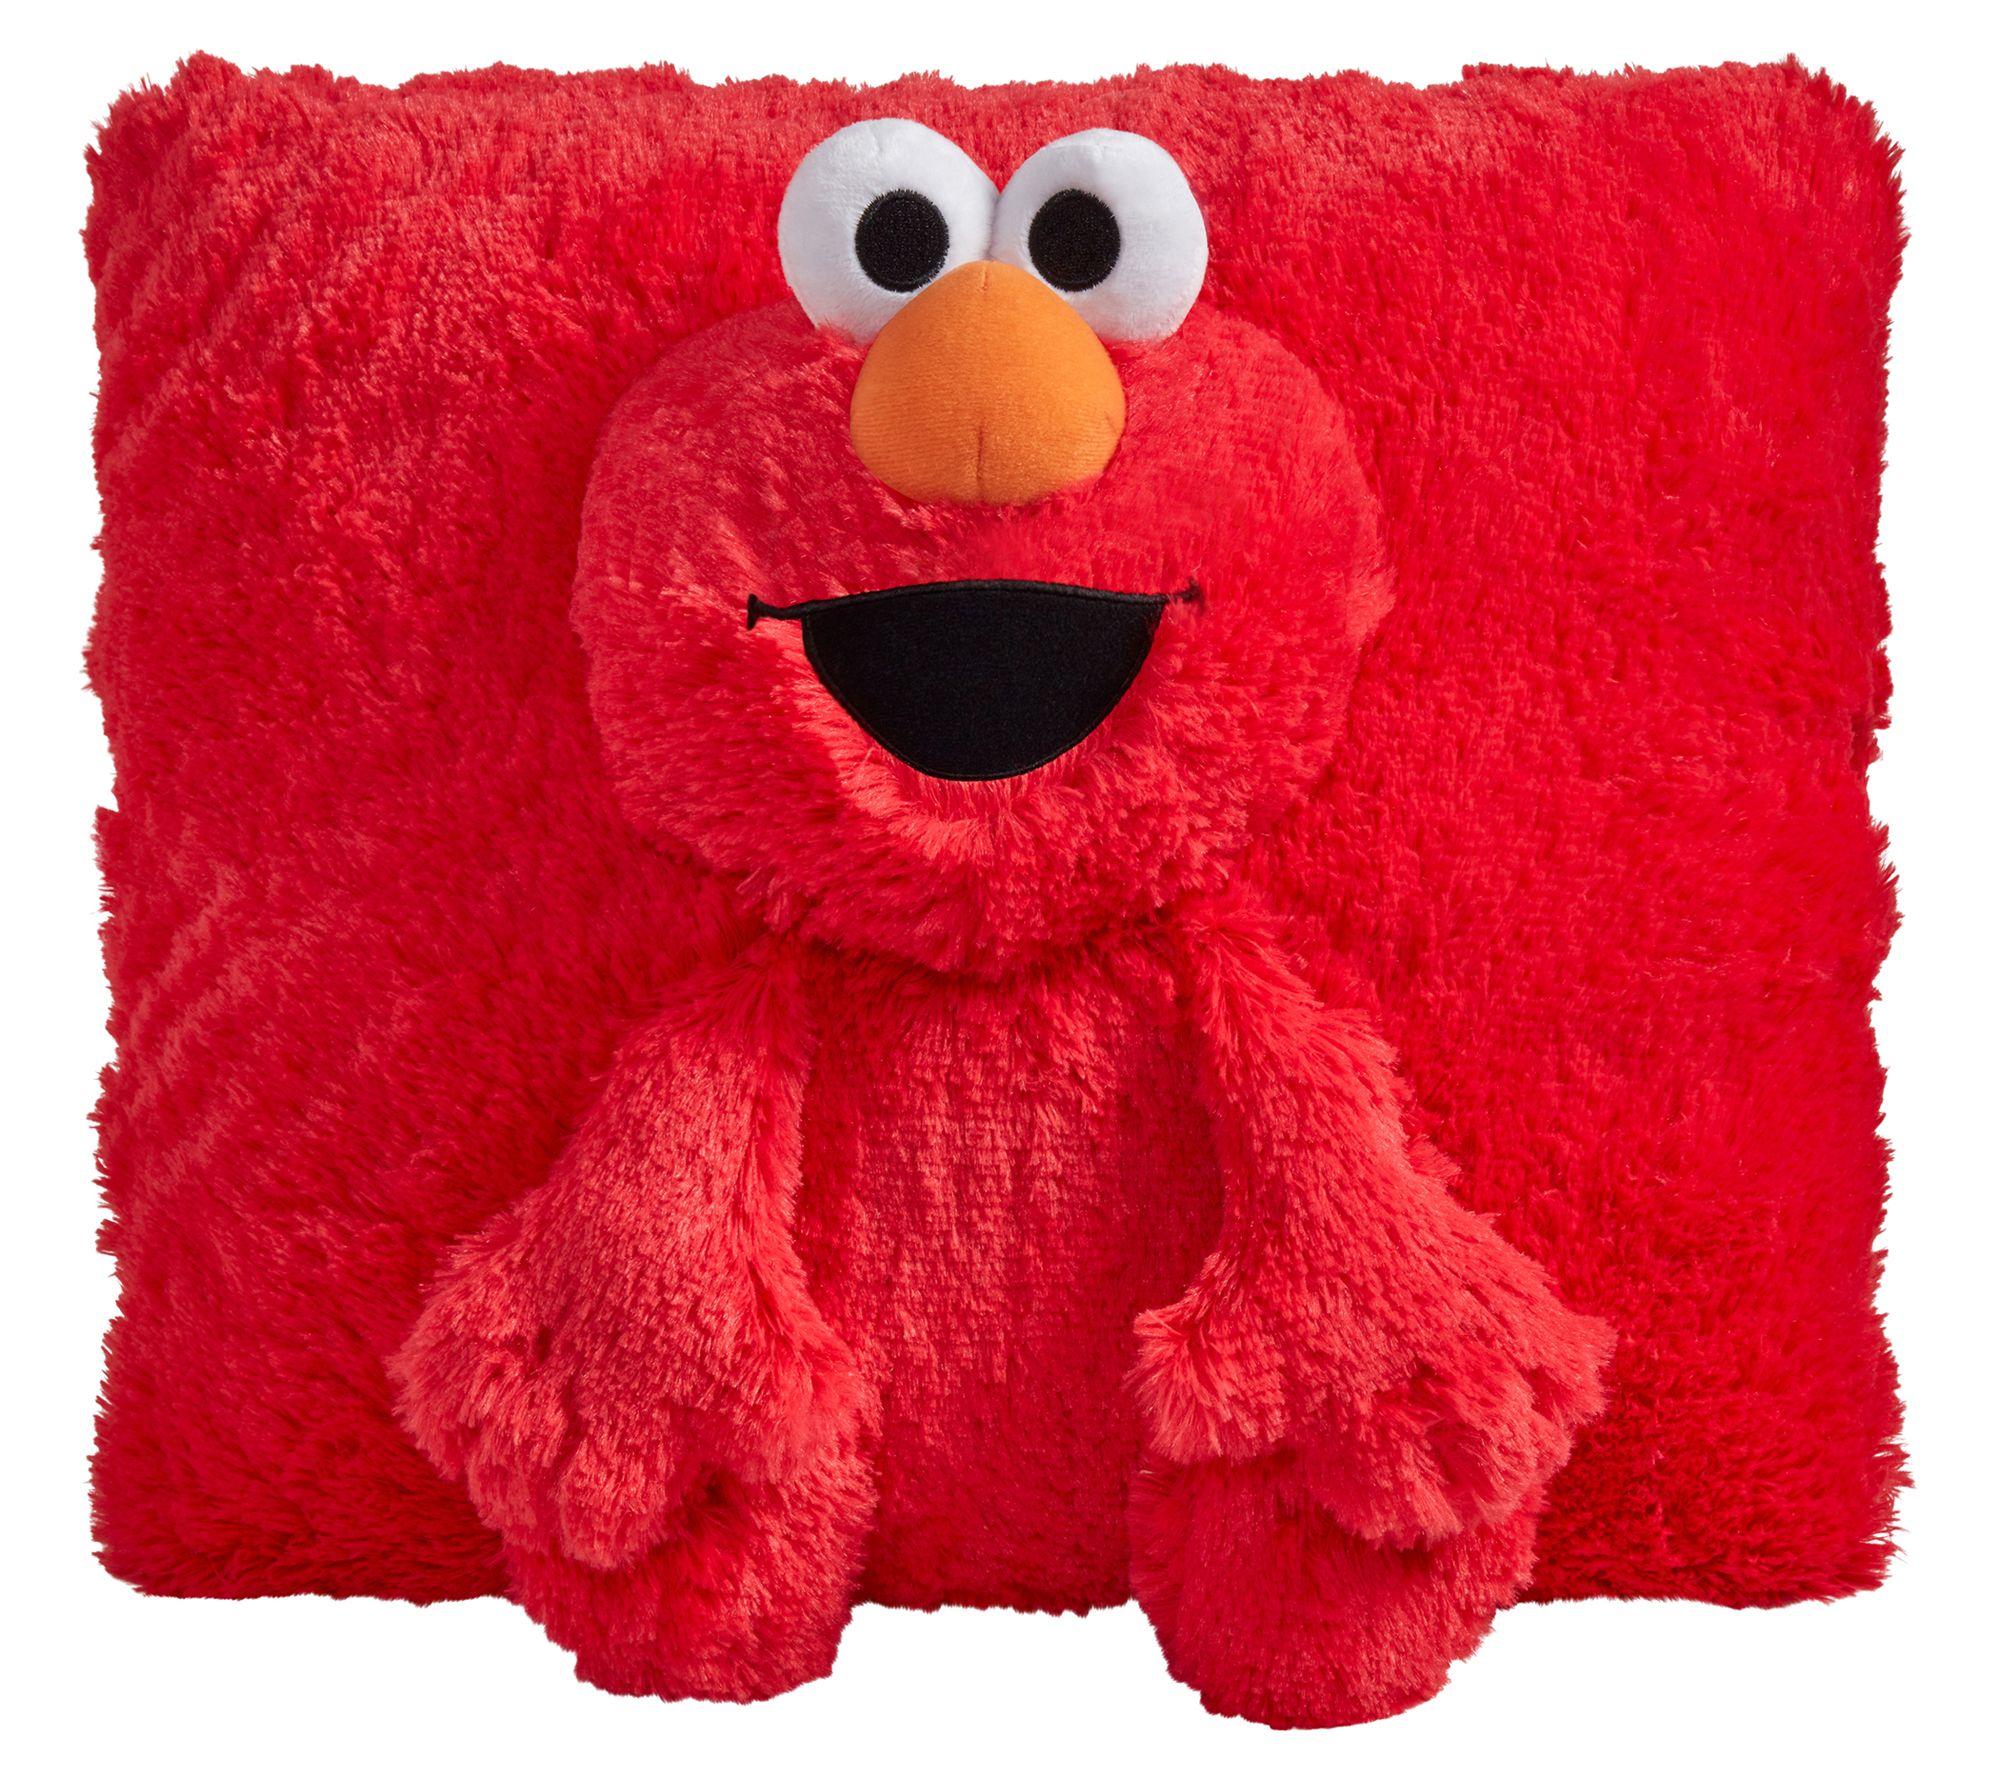 Pillow Pets Sesame Street Elmo Stuffed Animal Plush Toy Qvc Com